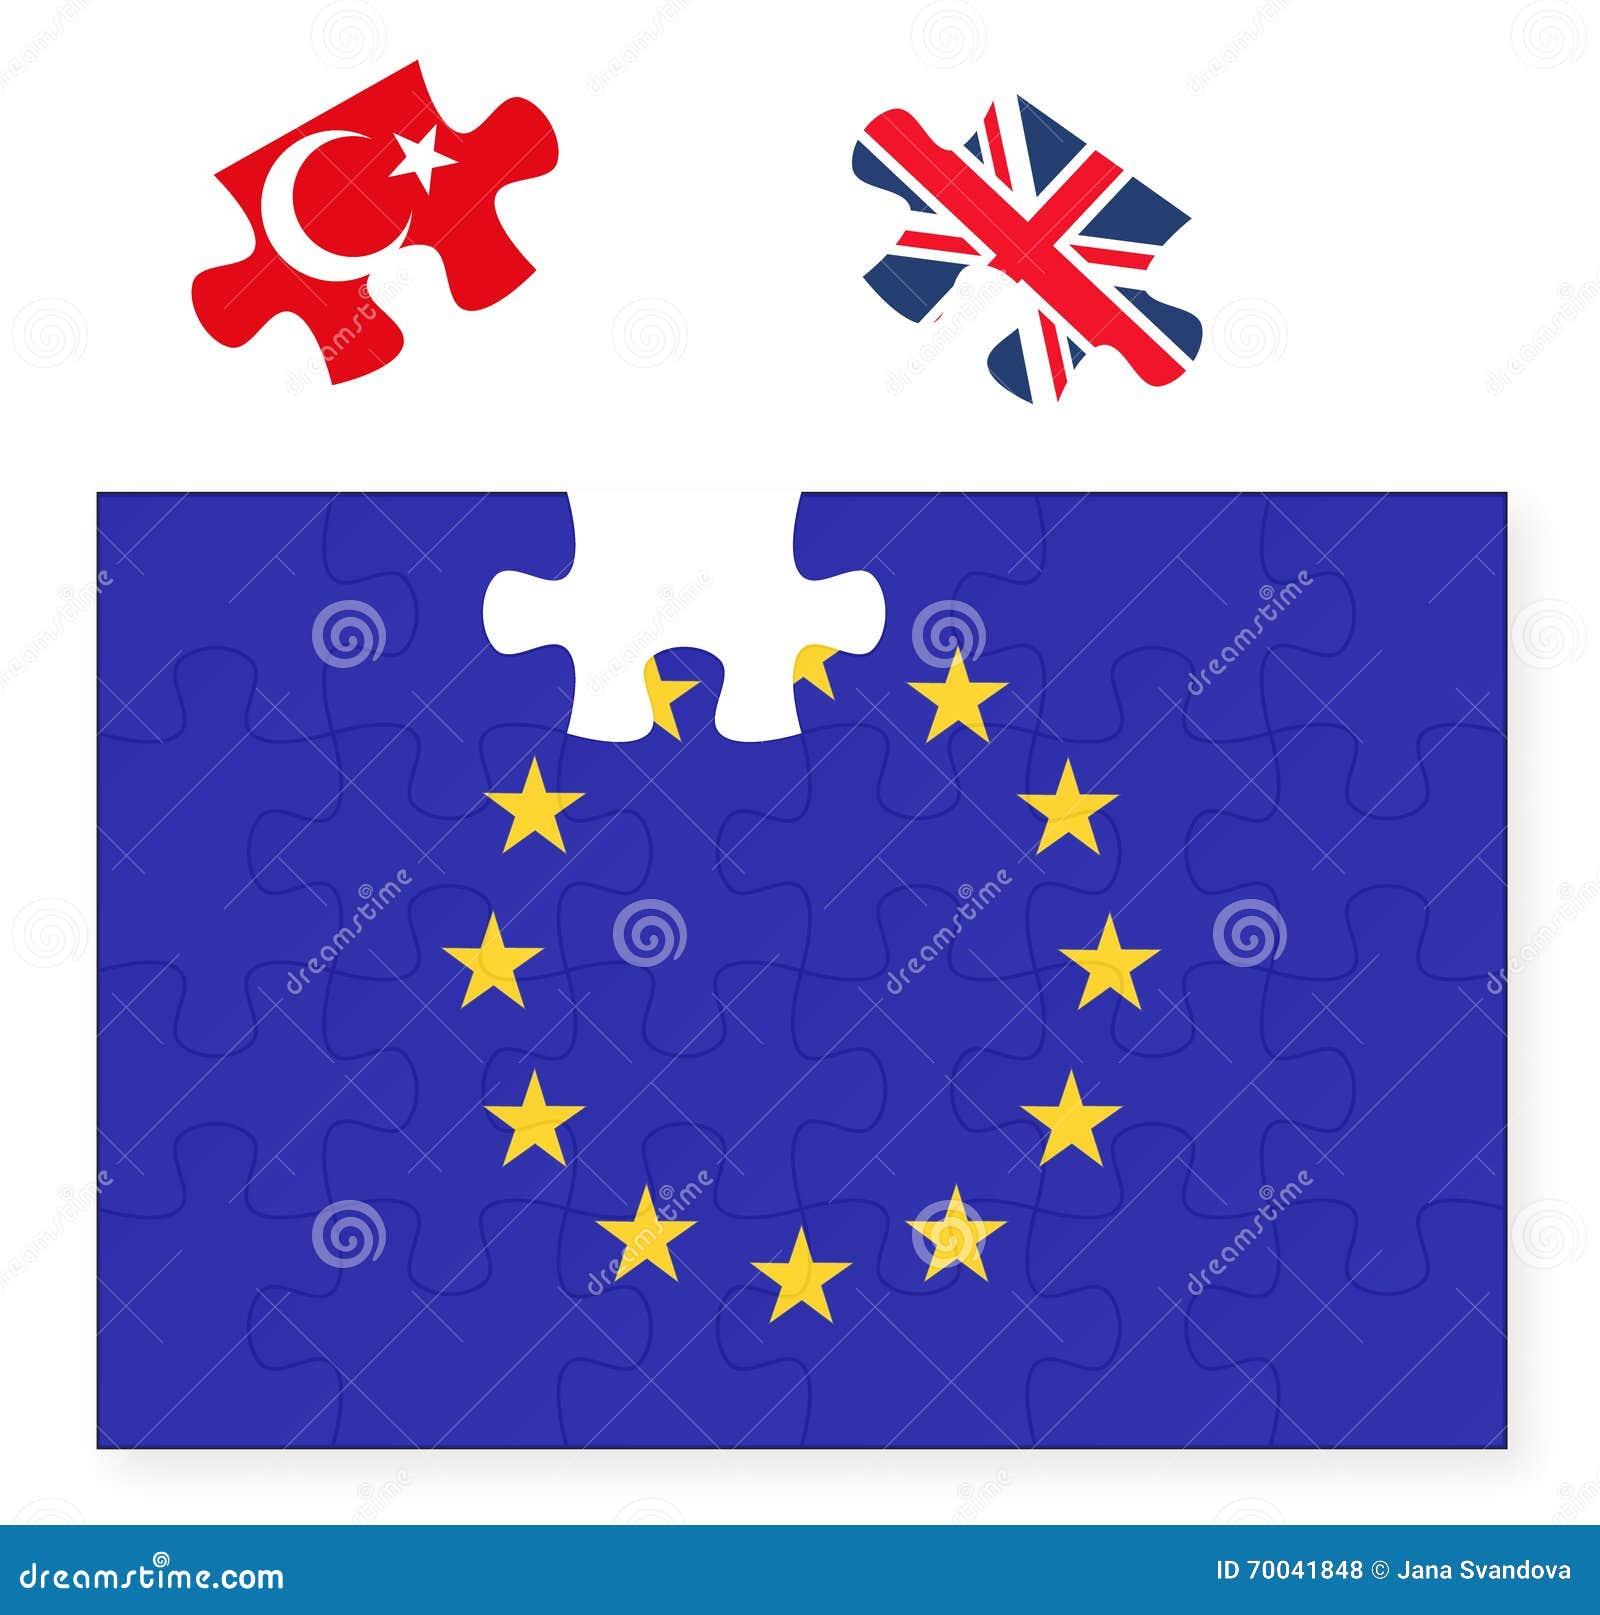 Uncategorized Turkey Puzzle european union flag missing united kingdom great britain jigsaw royalty free vector